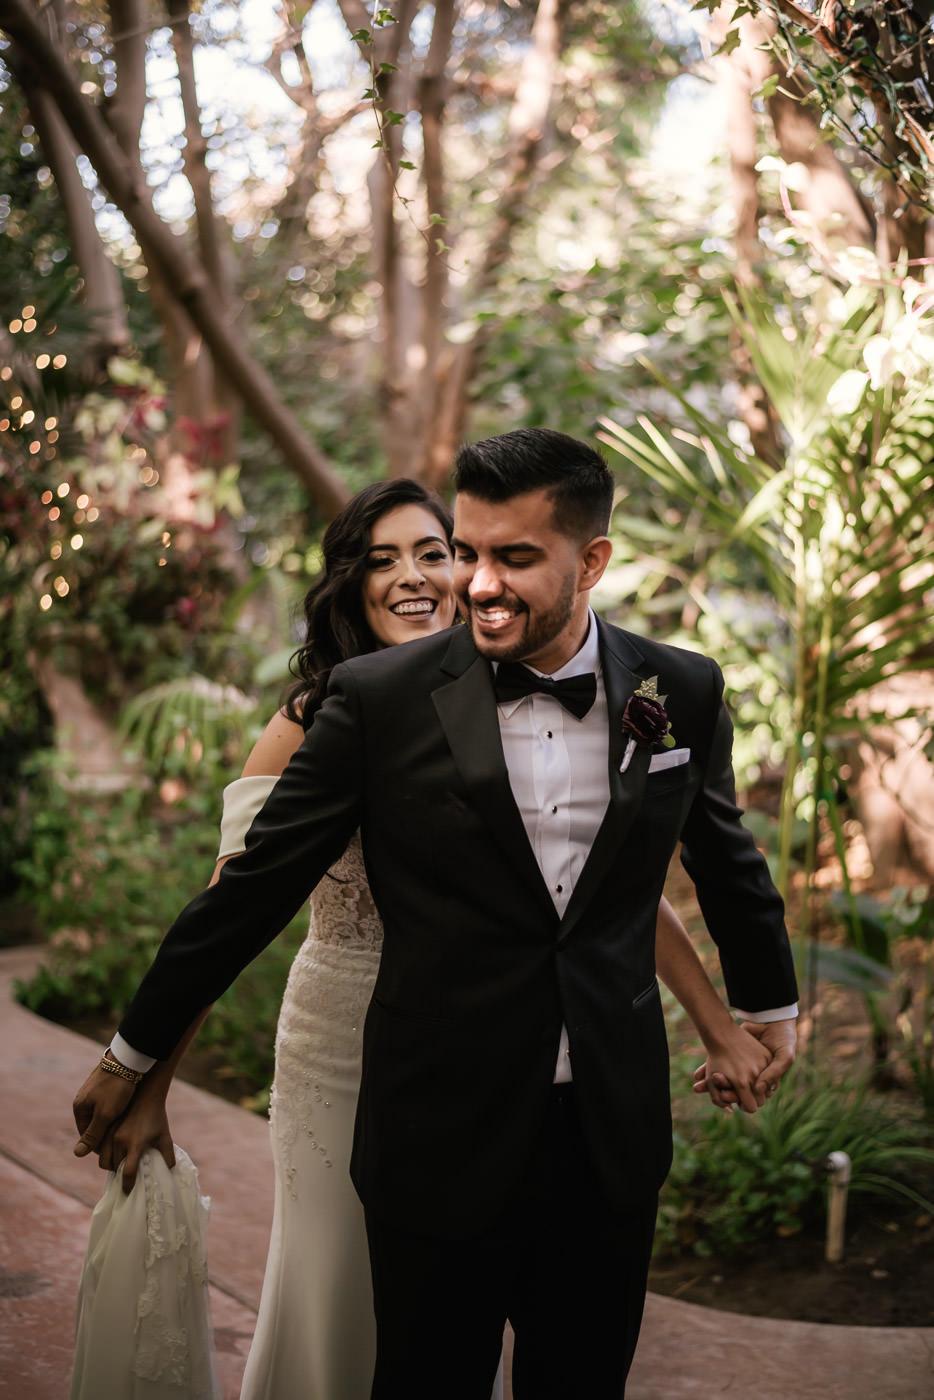 eden-gardens-wedding-photographer-romantic-25.jpg